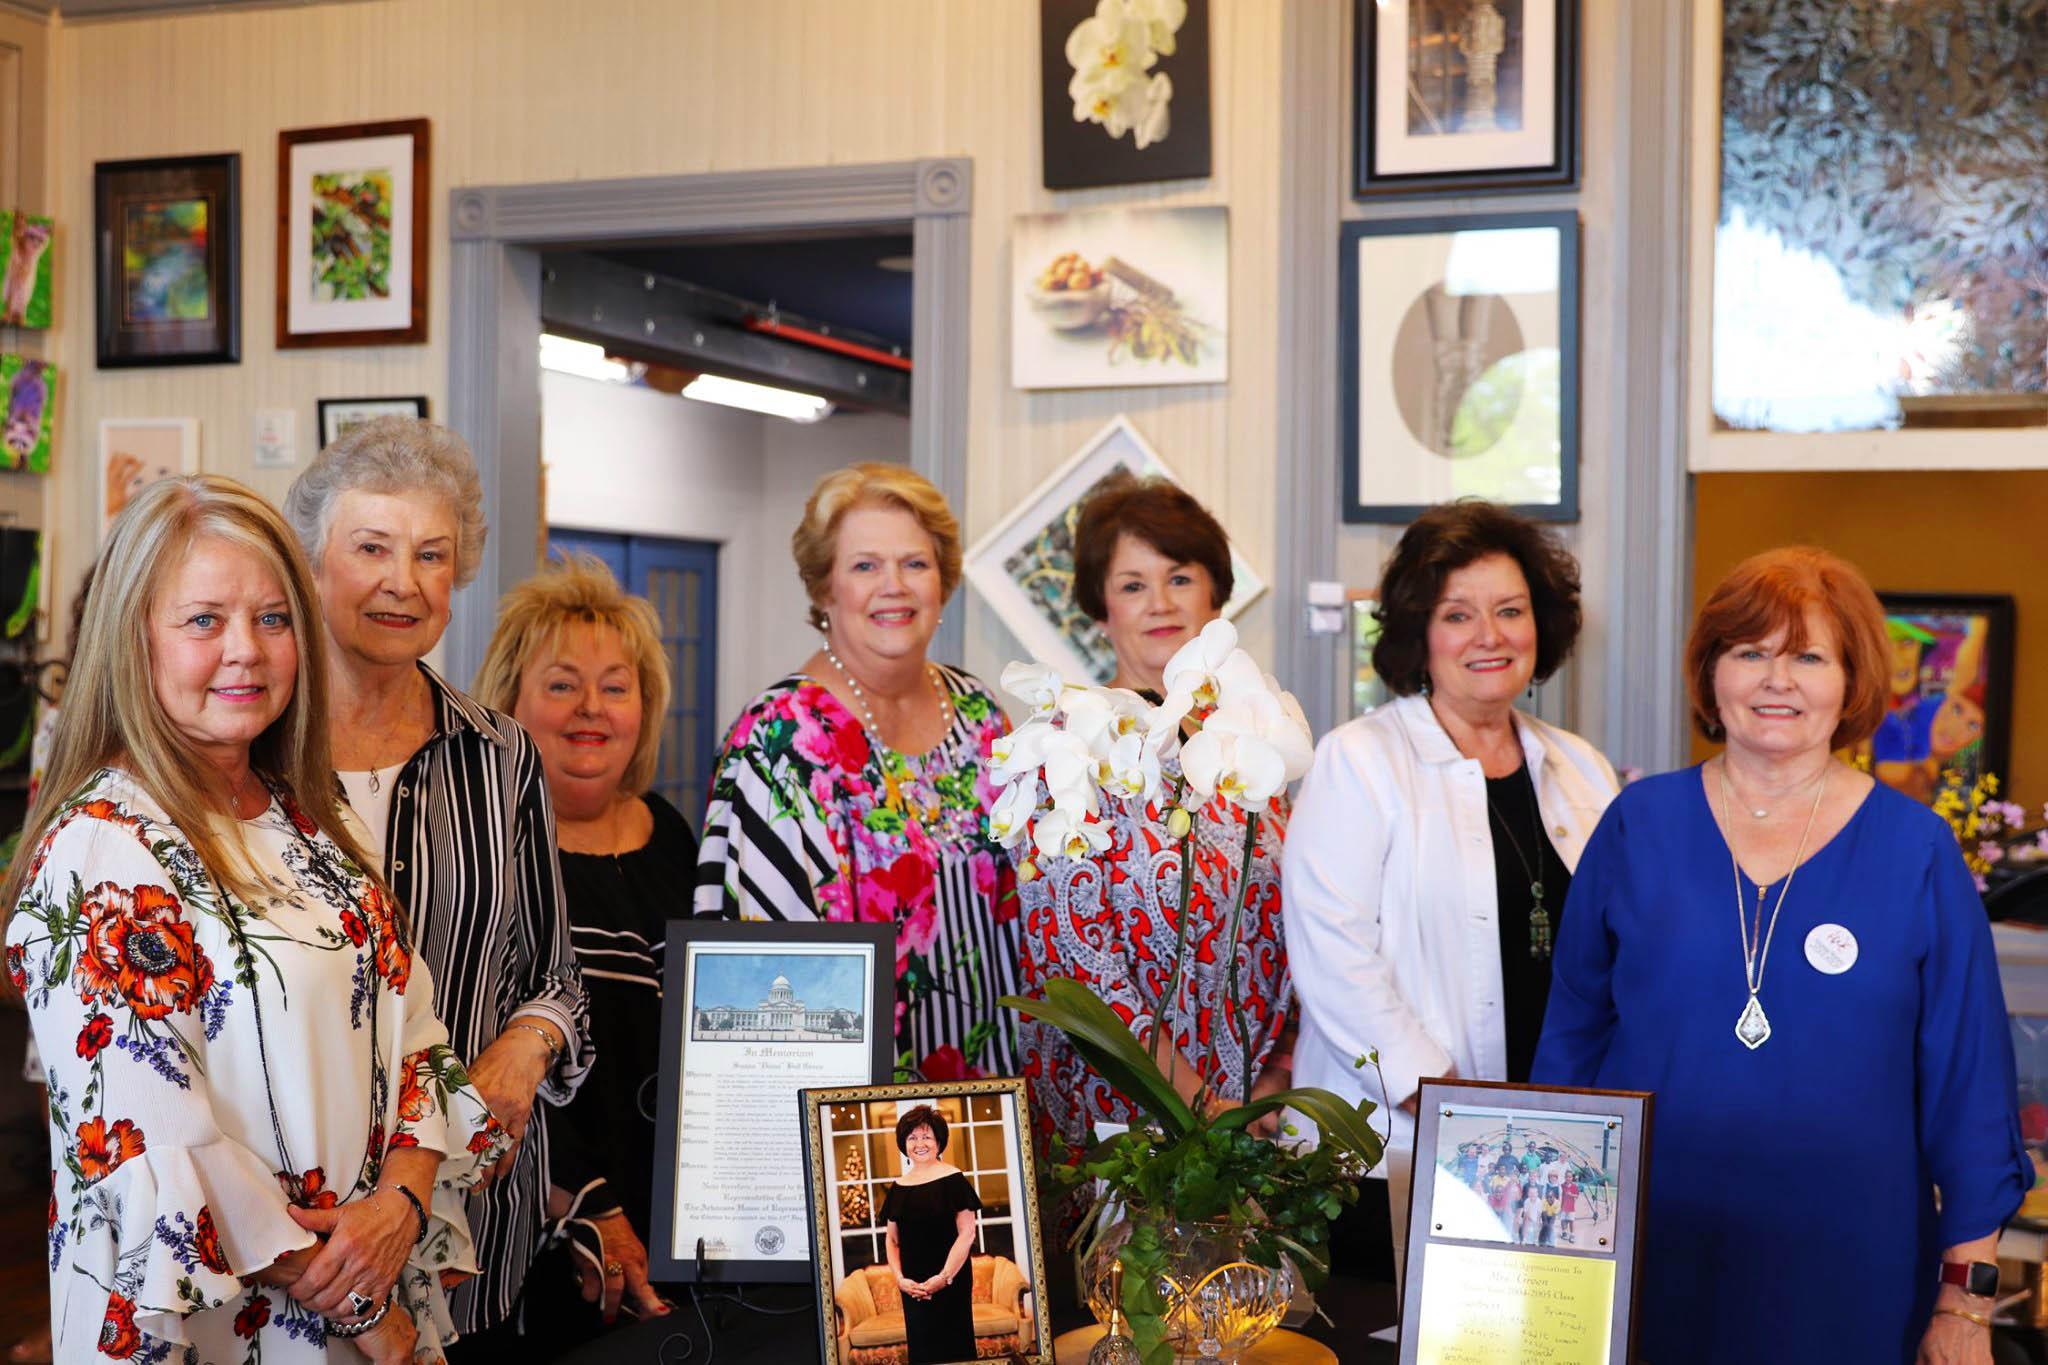 Sue Taylor, Katy Daniel, Tricia Wilson, Peggy Mills, Carol Selph, Ann Johnson and Kay Thomas